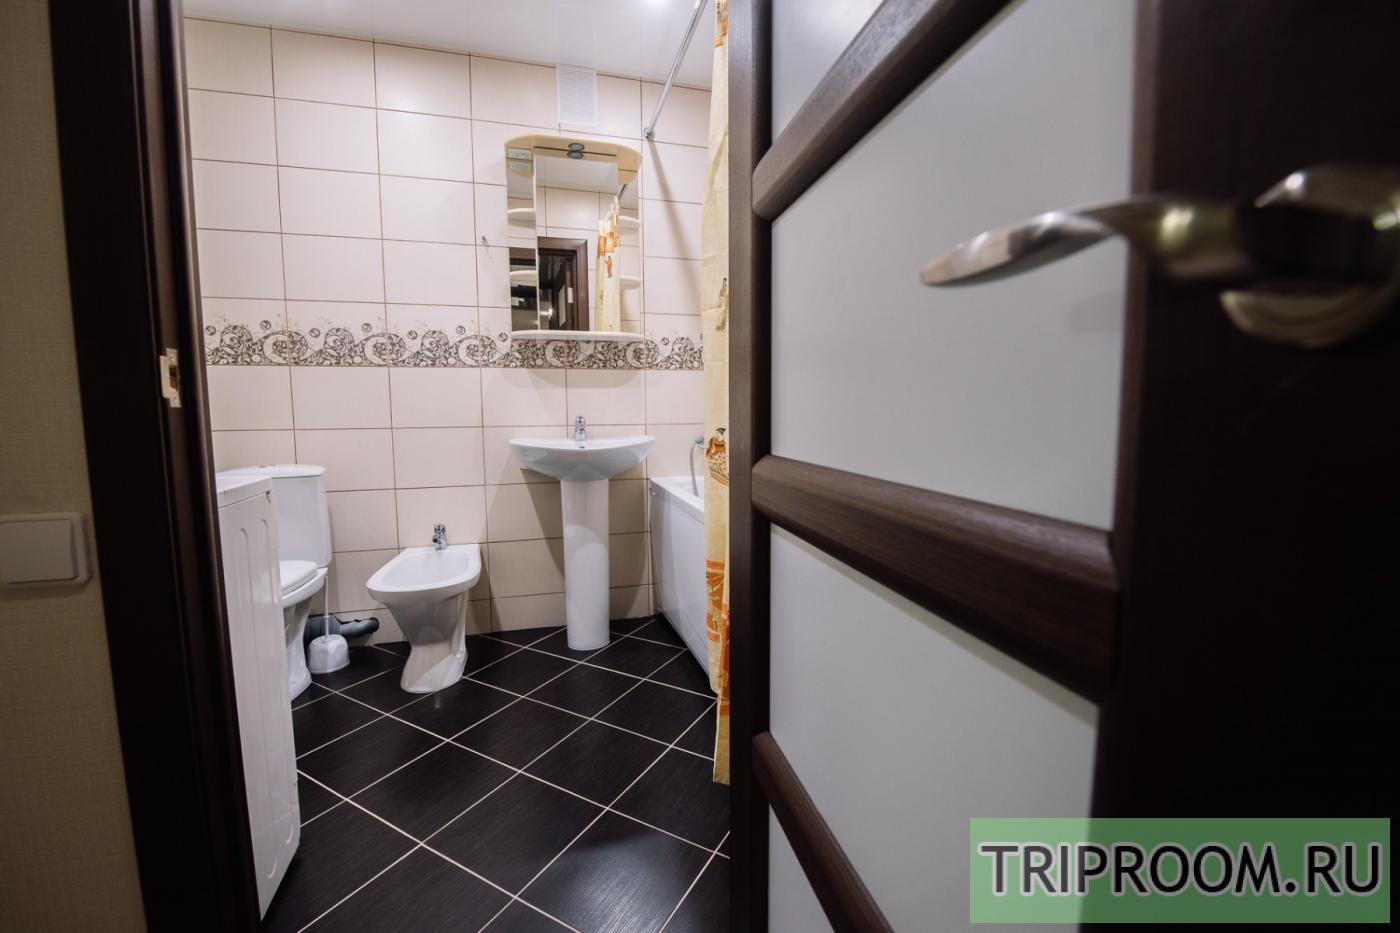 1-комнатная квартира посуточно (вариант № 21616), ул. Нормандия-Неман, фото № 11